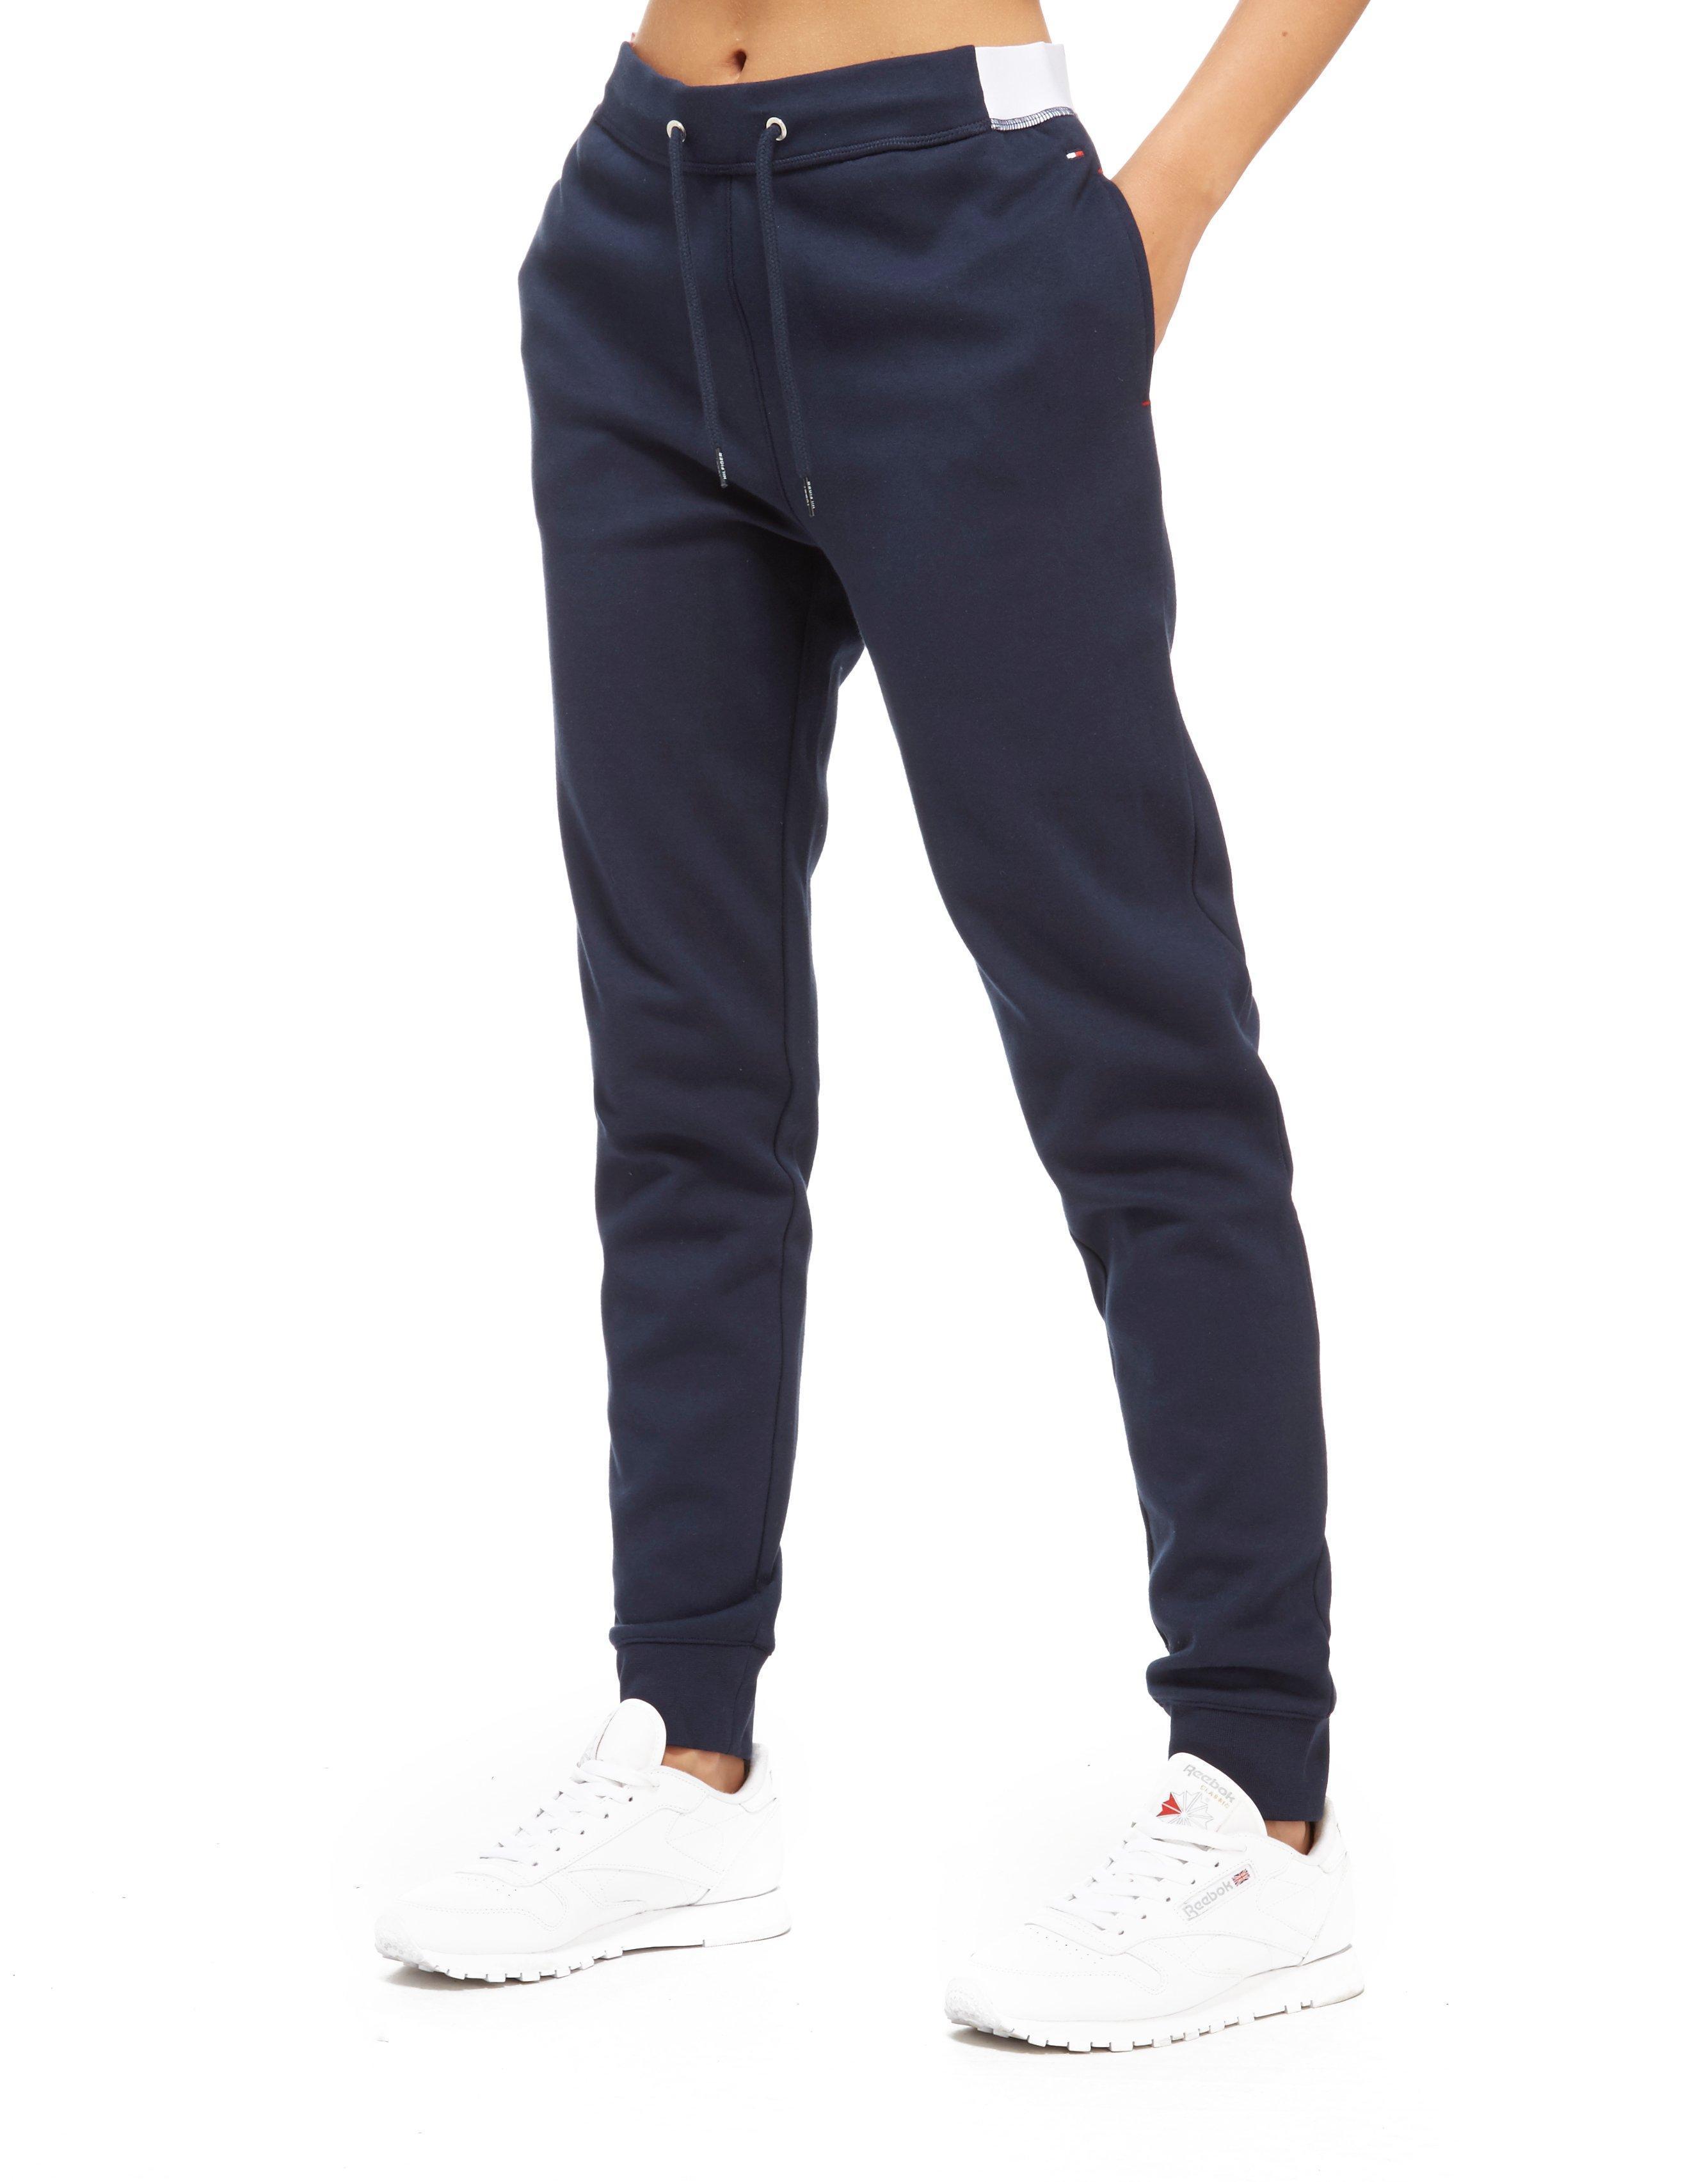 Drop Crotch Jeans Women